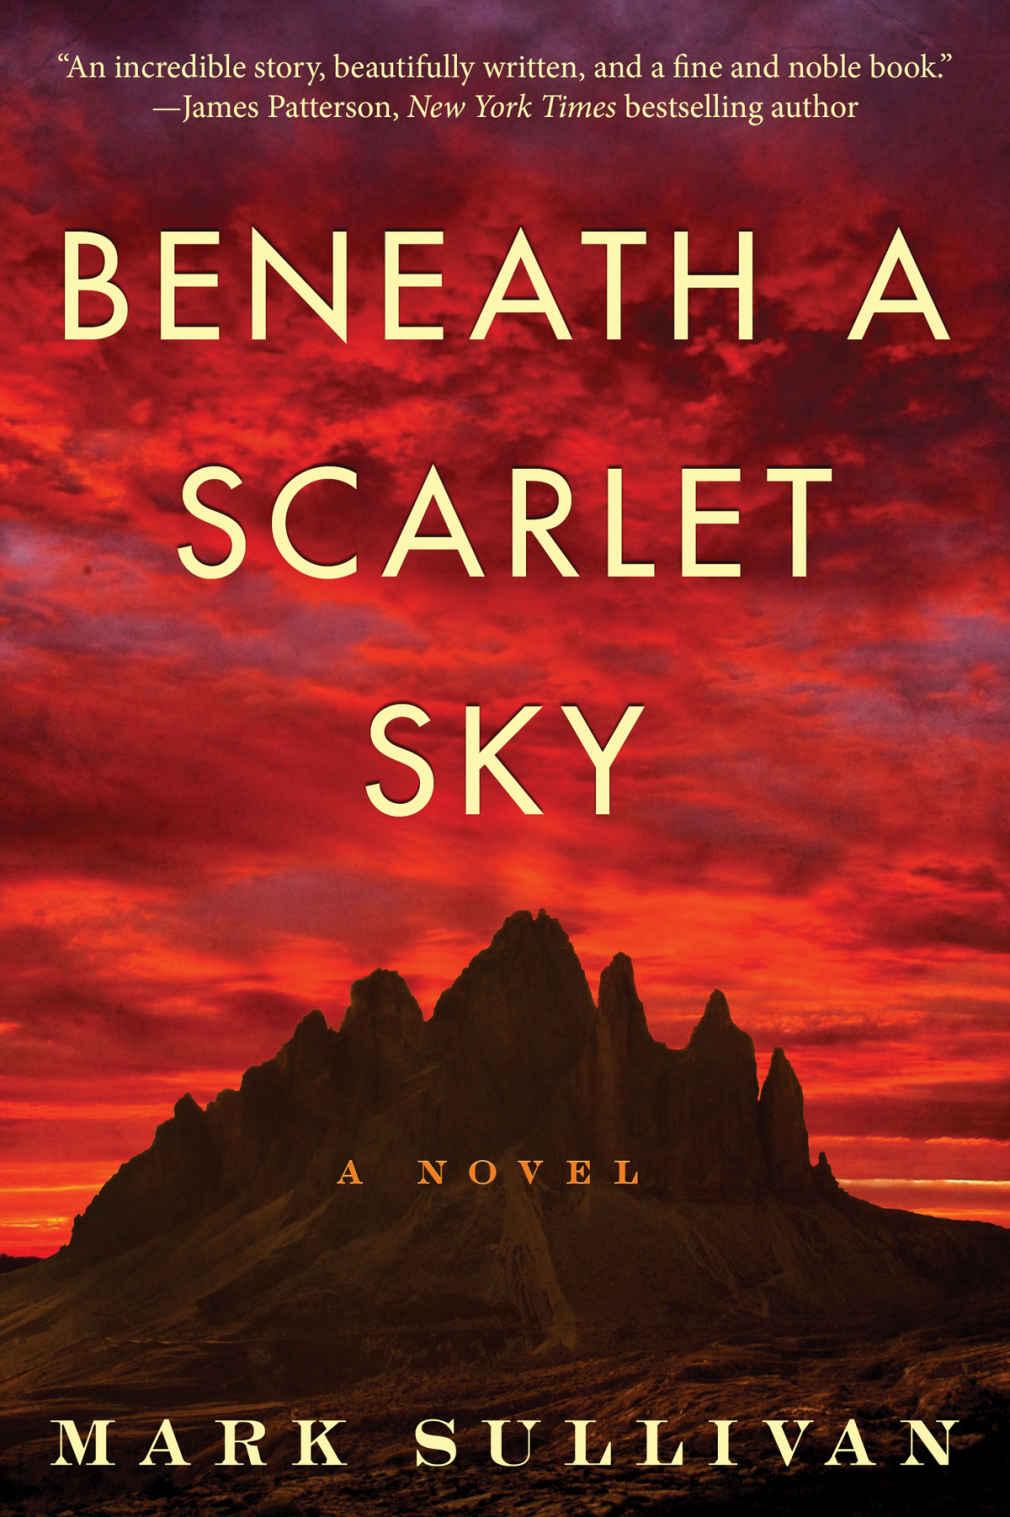 Beneath a Scarlet Sky: A Novel - Mark Sullivan [kindle] [mobi]